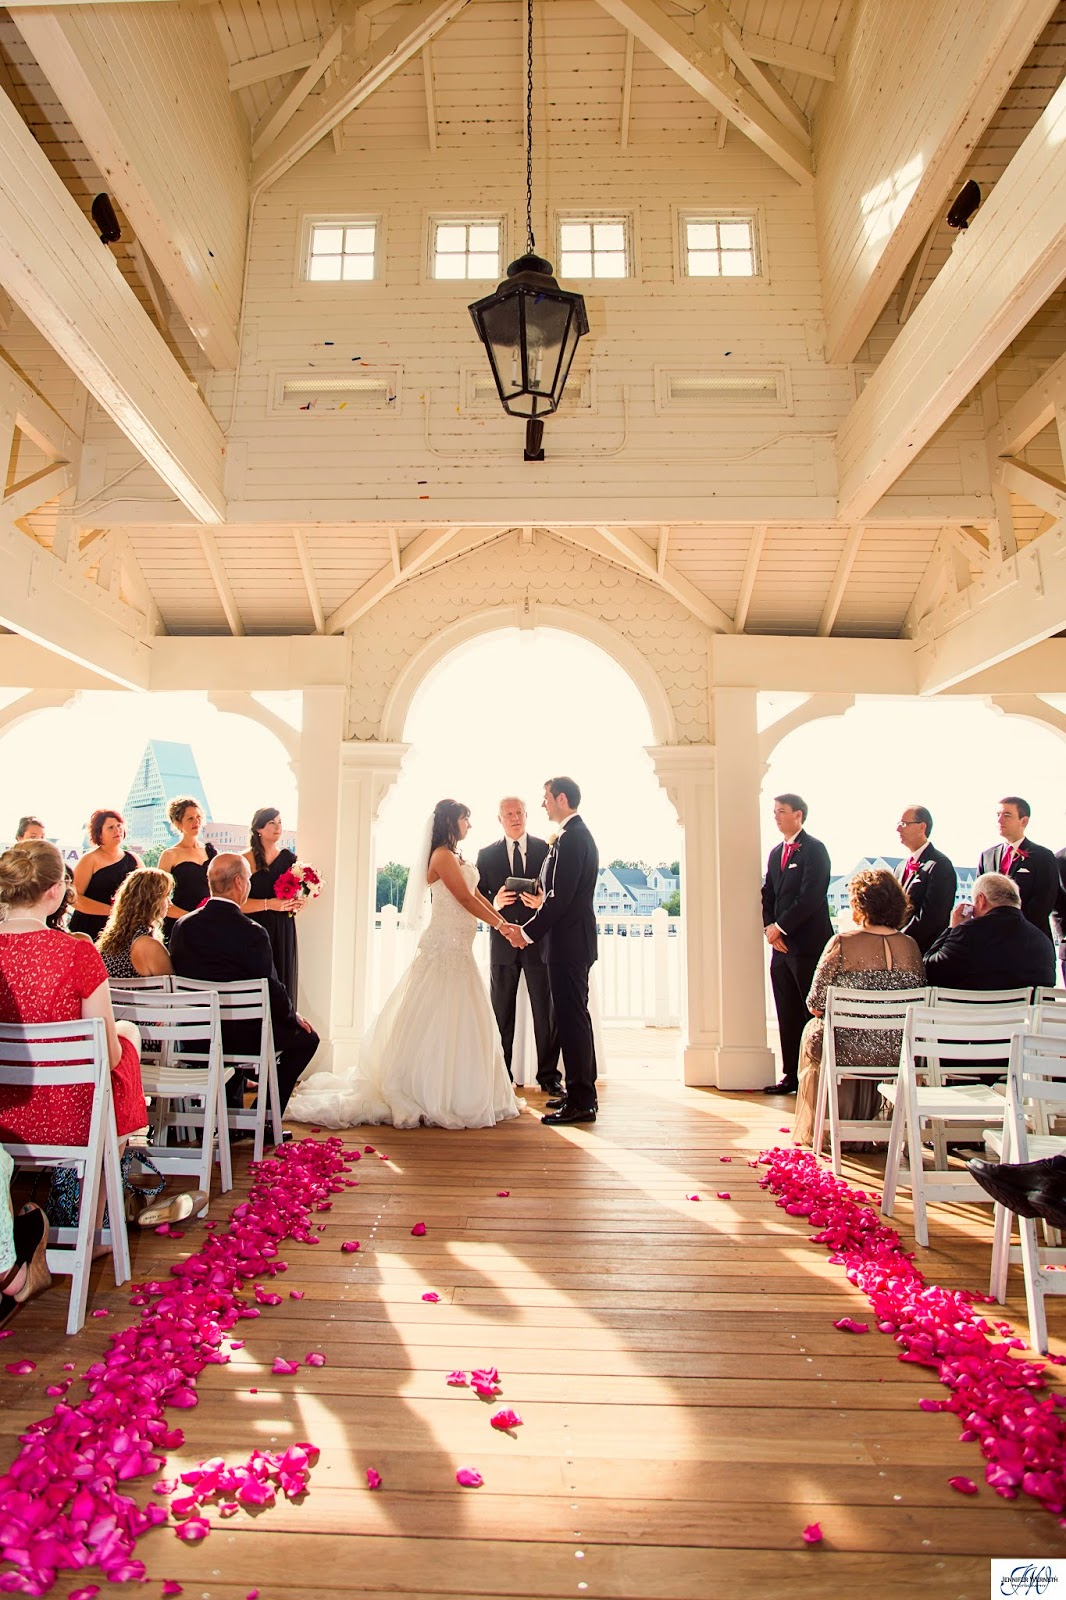 Wedding Photography At Walt Disney World Fl Boardwalk Seabreeze Point Reception California Grill Contempory Resort